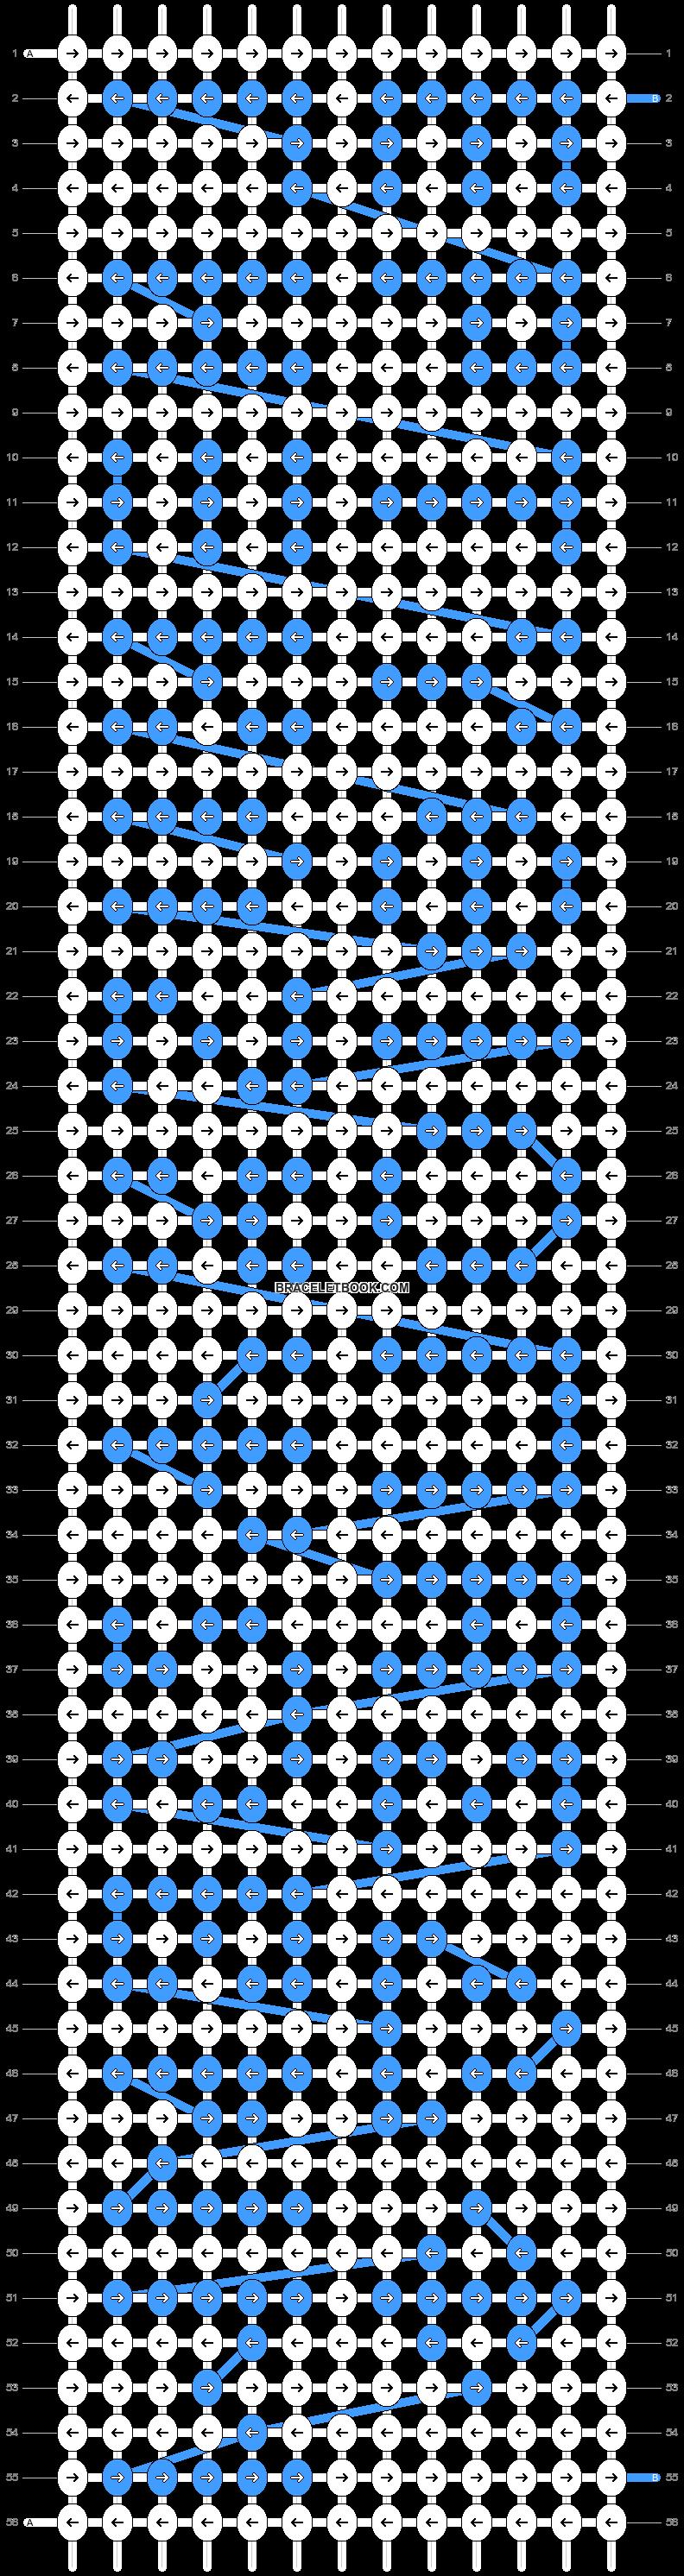 Alpha pattern #19662 pattern